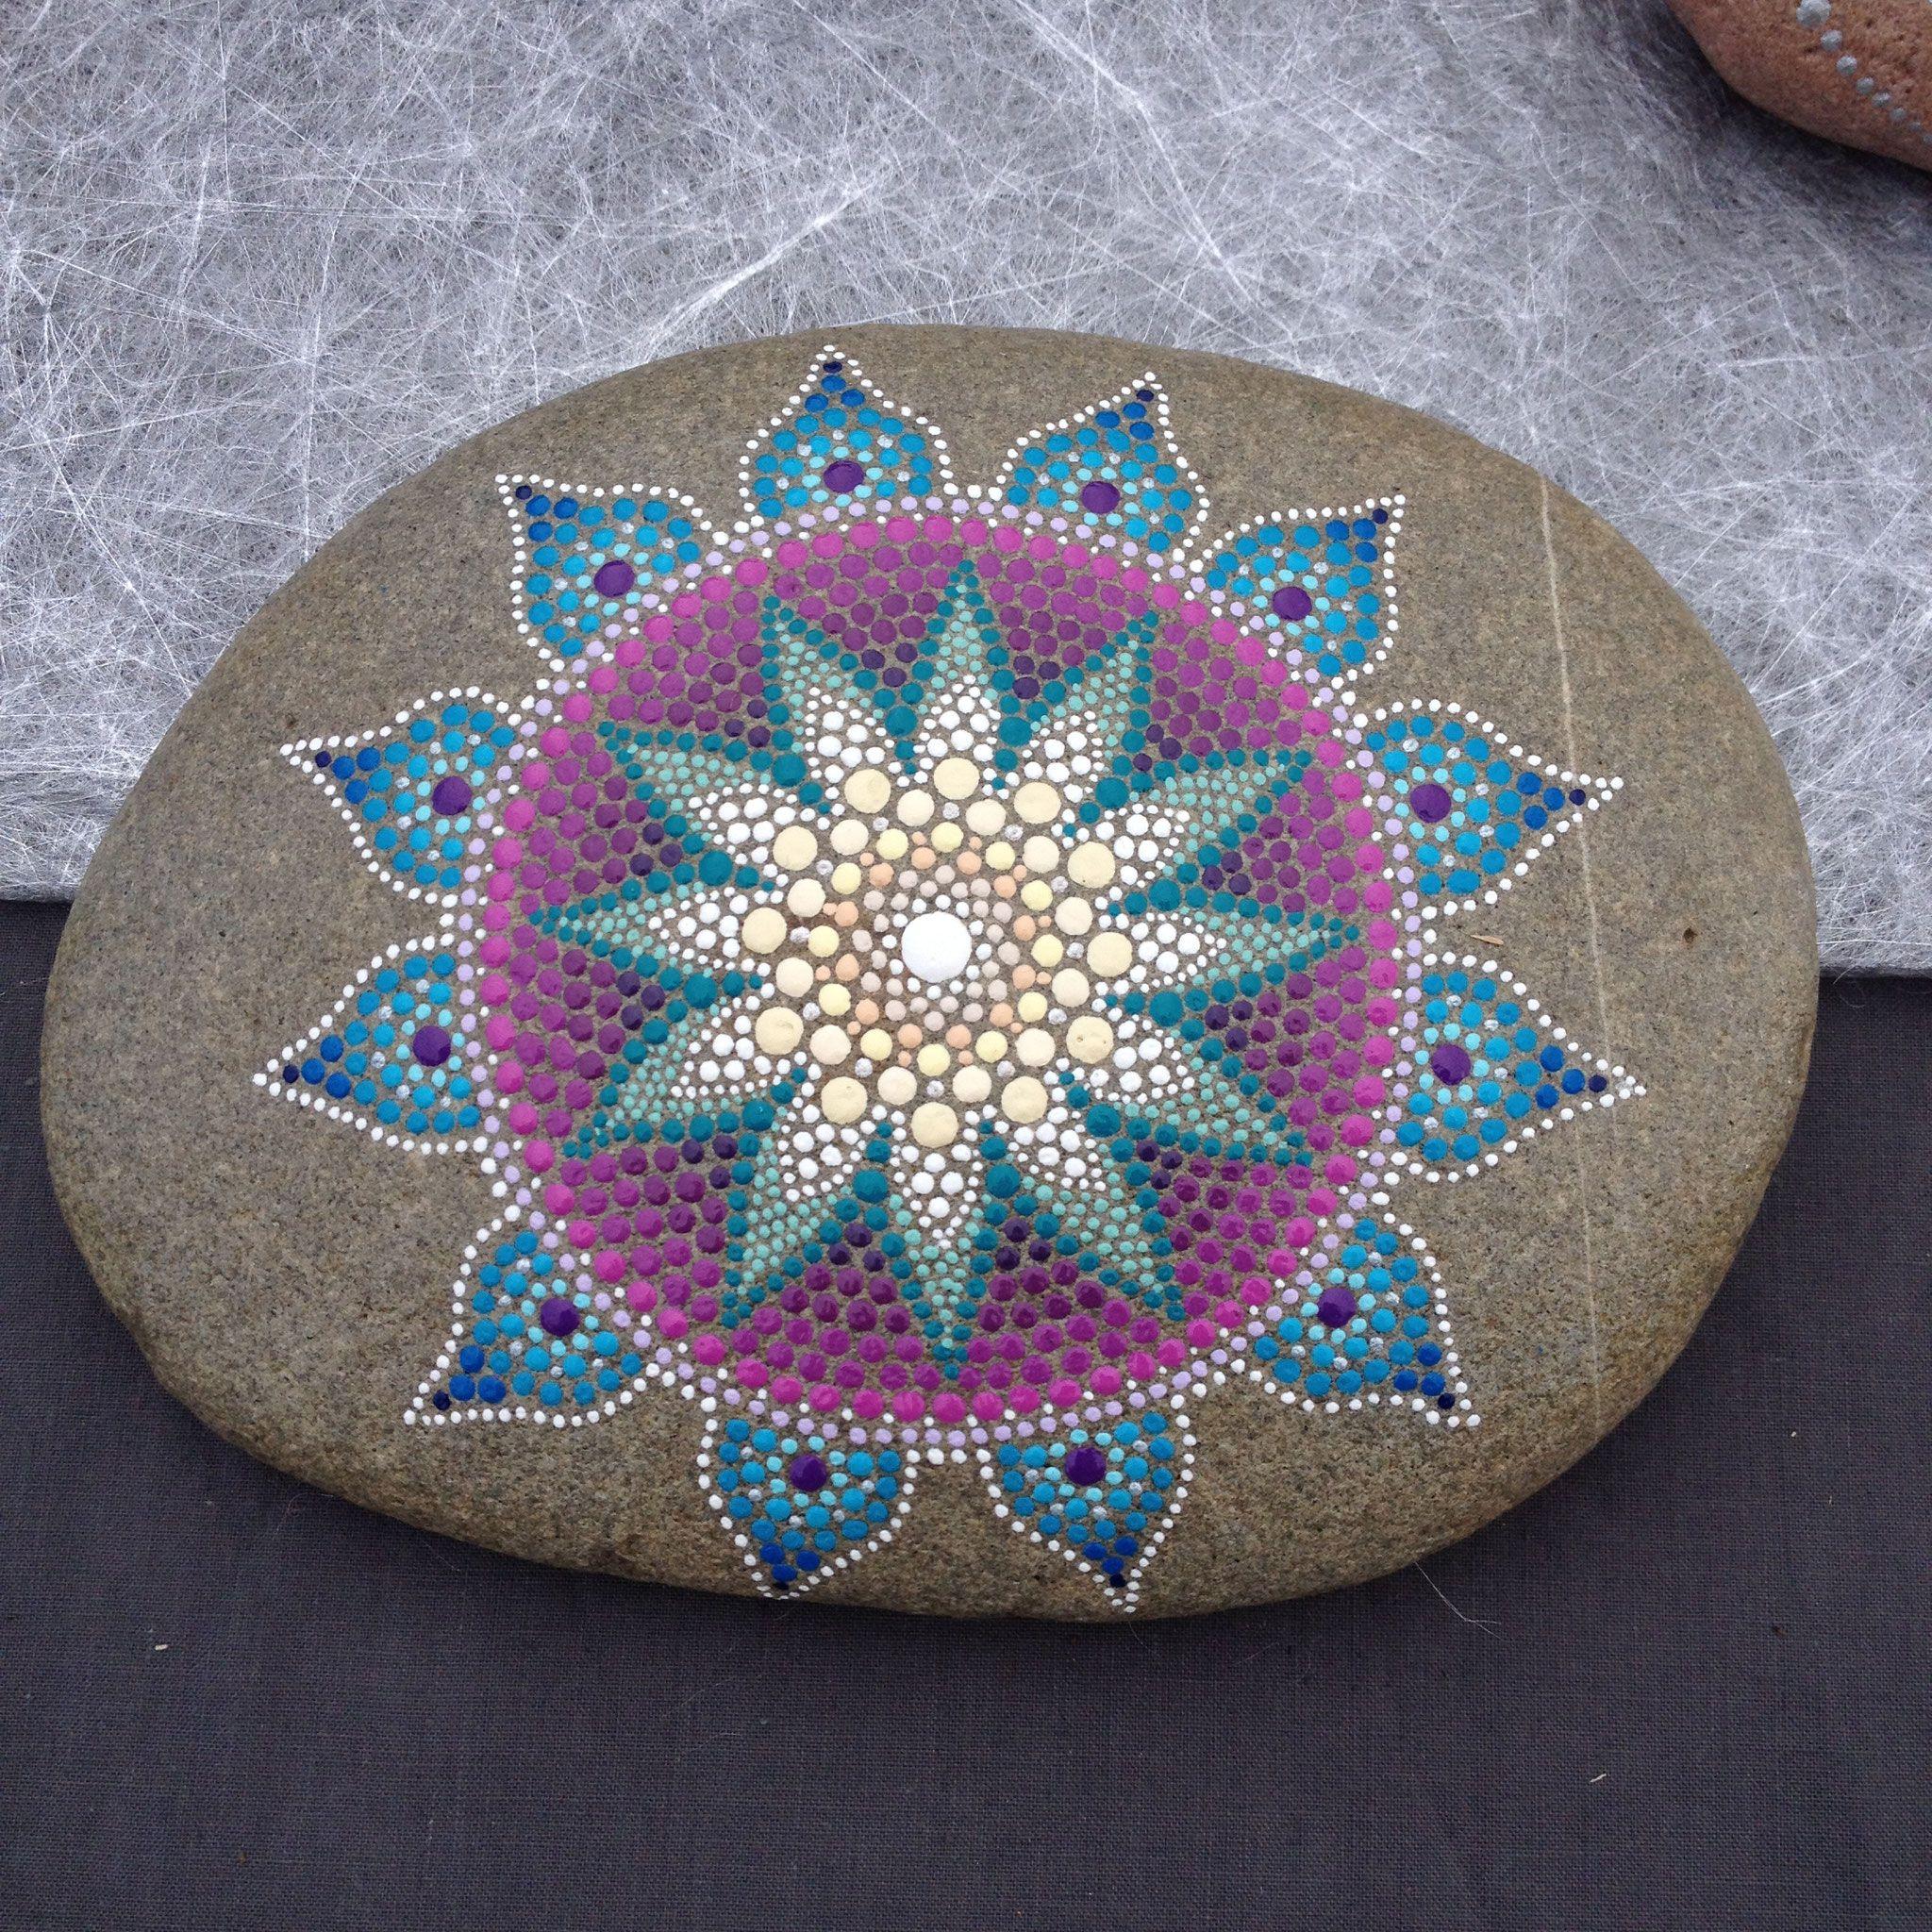 peinture acrylique carinecreation65 stones dot art. Black Bedroom Furniture Sets. Home Design Ideas